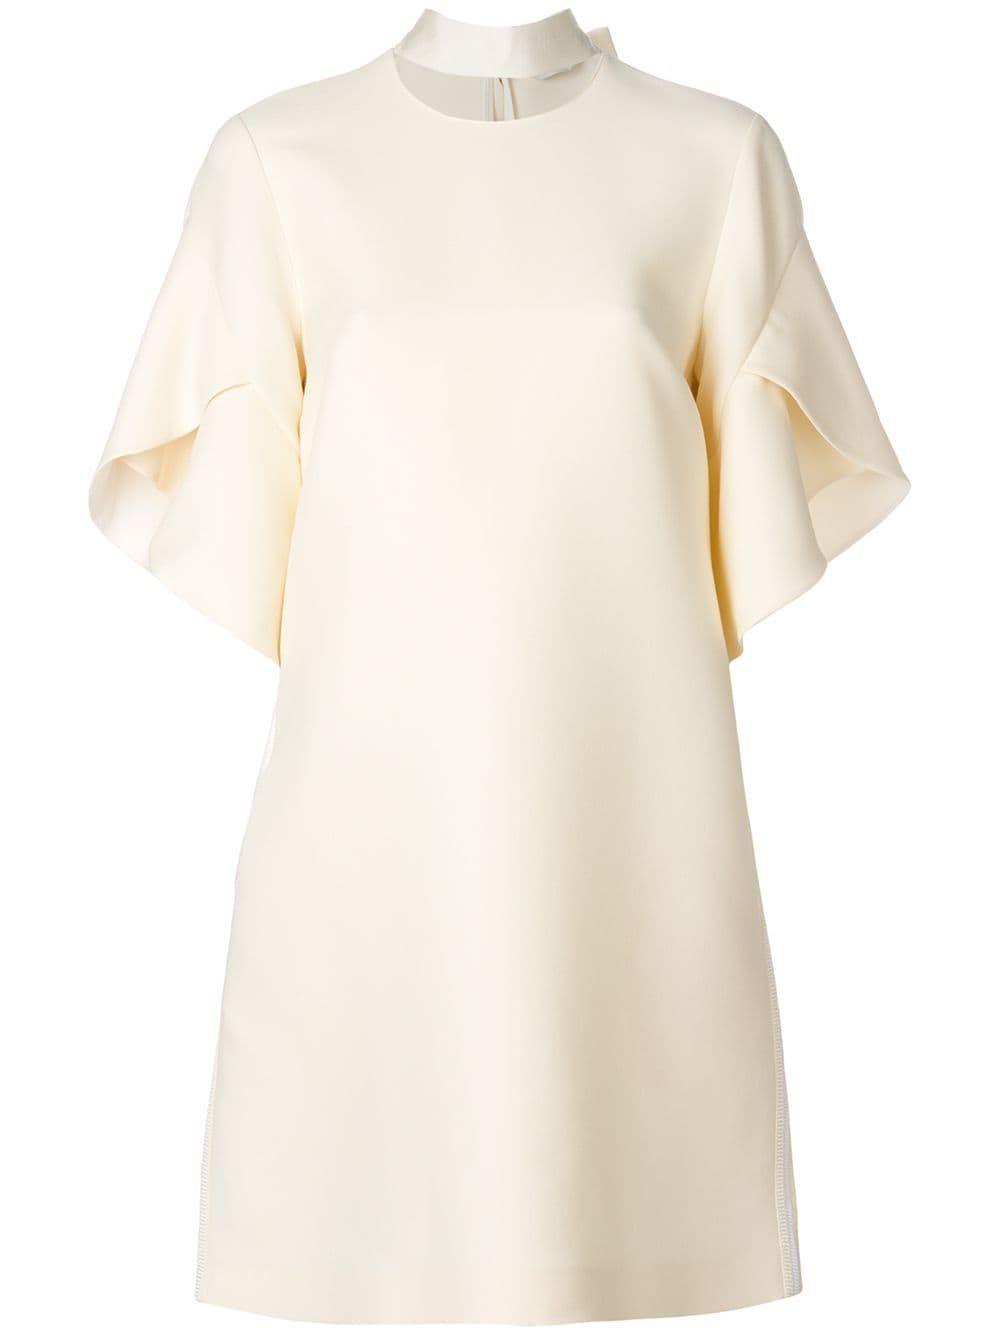 Fendi Collar Detail Flared Dress Farfetch White Short Sleeve Dress Fit N Flare Dress Floral Dresses Short [ 1334 x 1000 Pixel ]